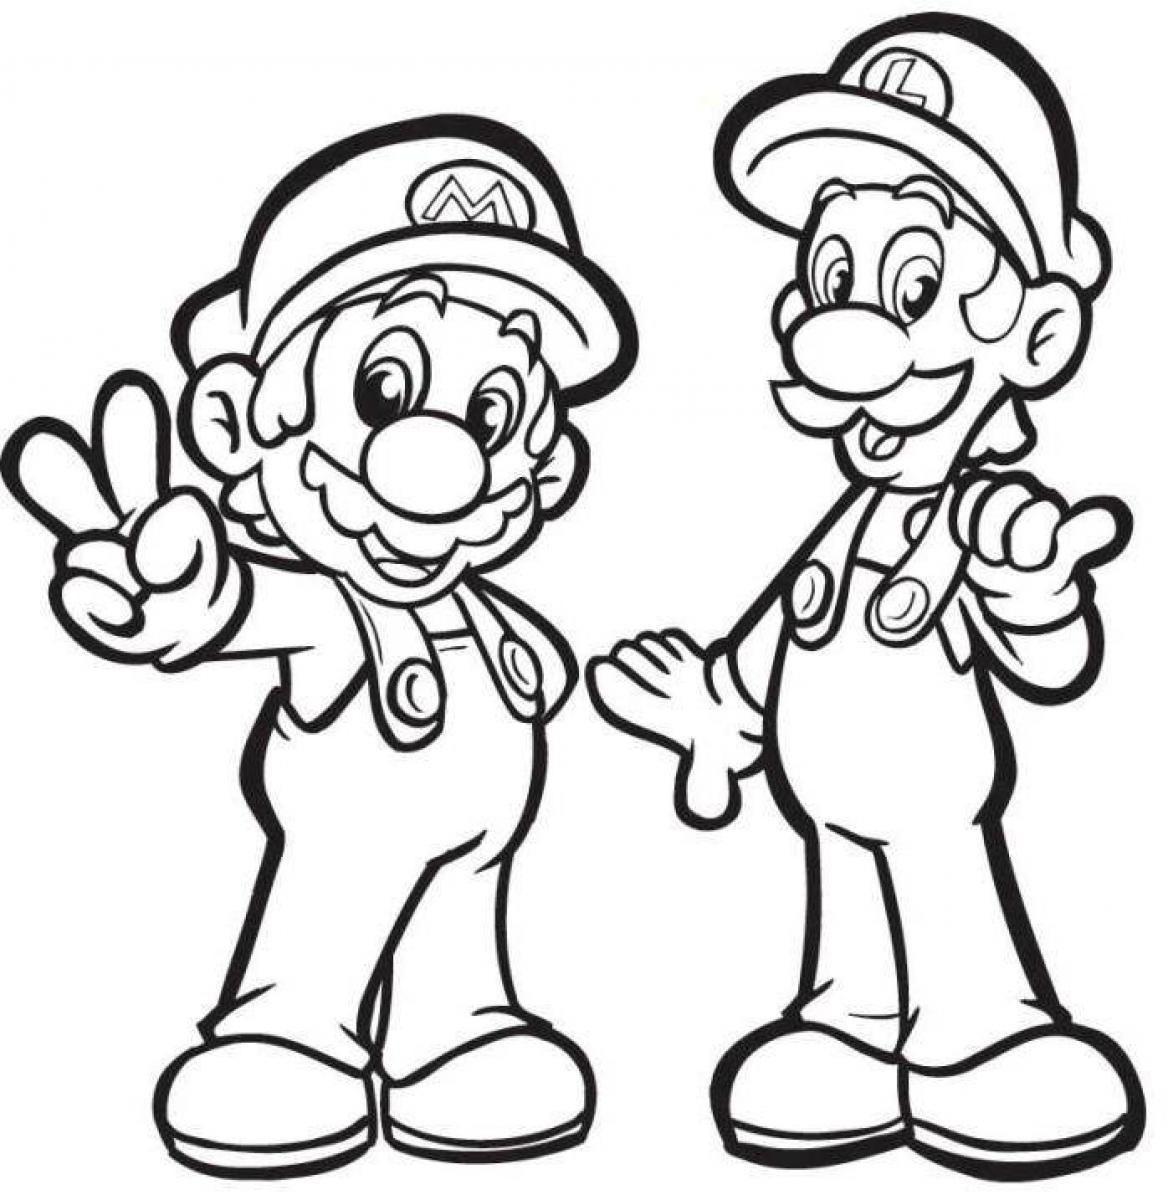 Luigi Coloring Pages Printable Luigi Coloring Pages Free Luigi